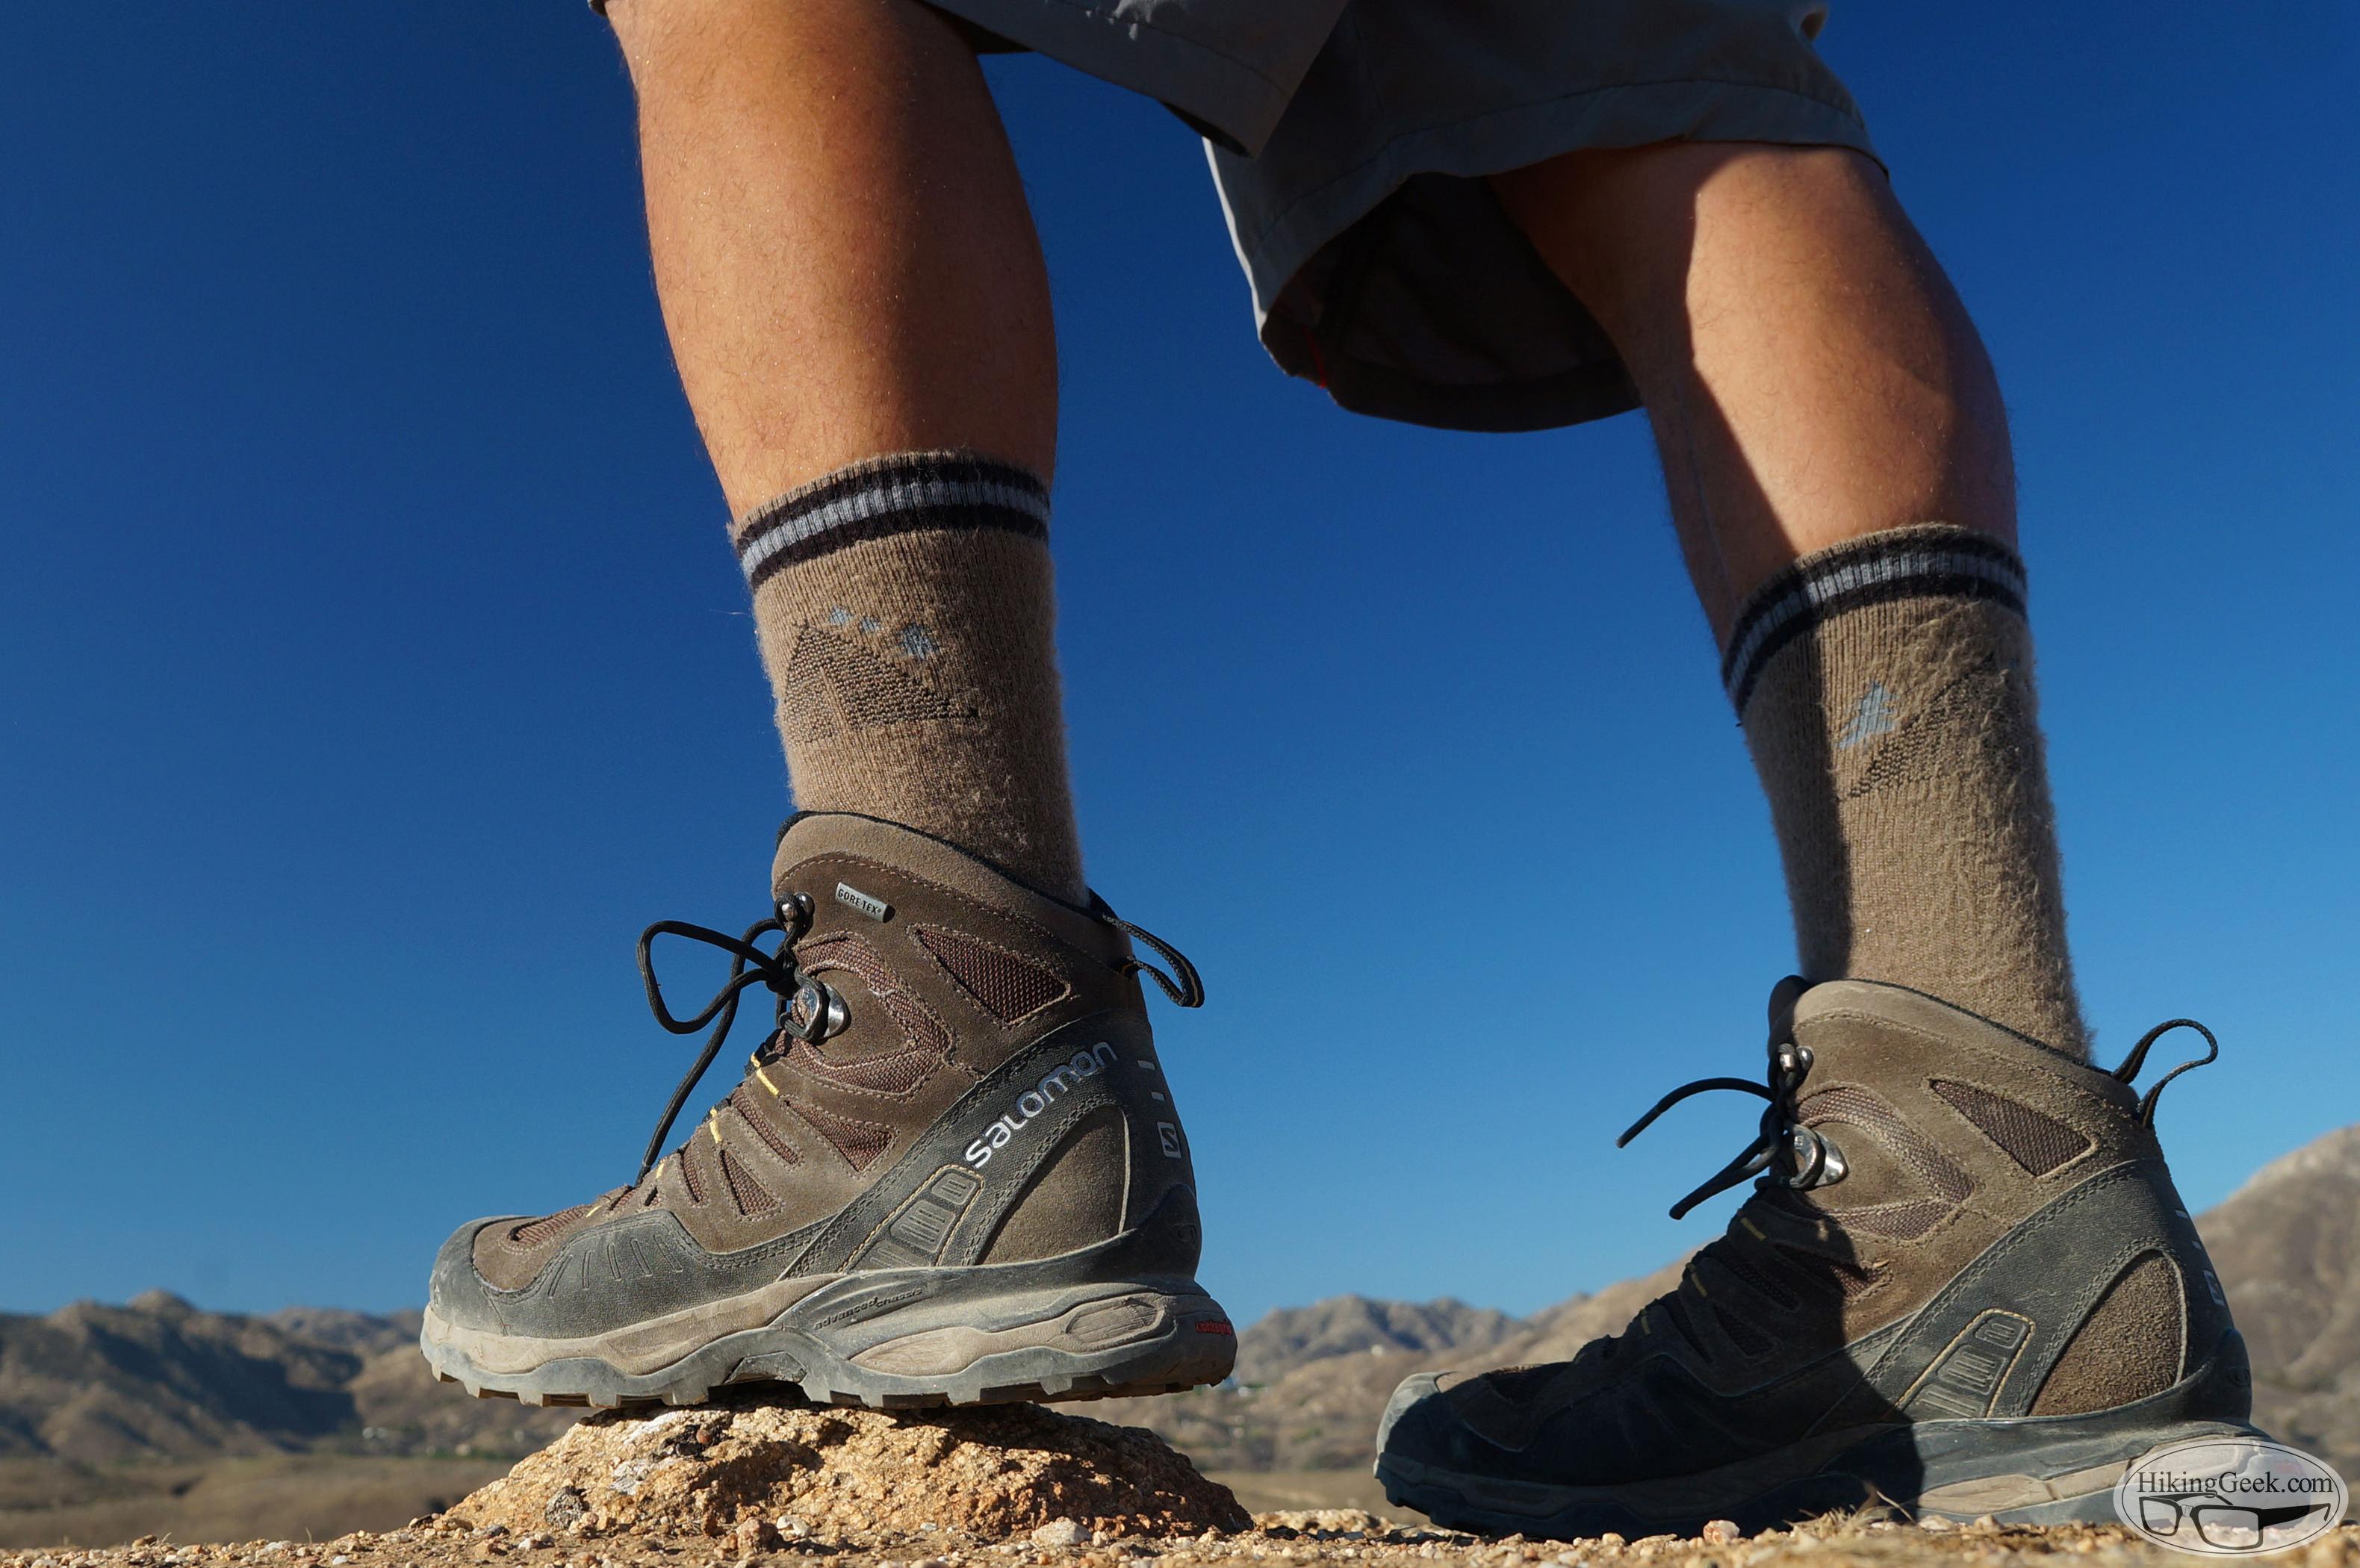 Gear Review: Farm to Feet Merino Wool Socks